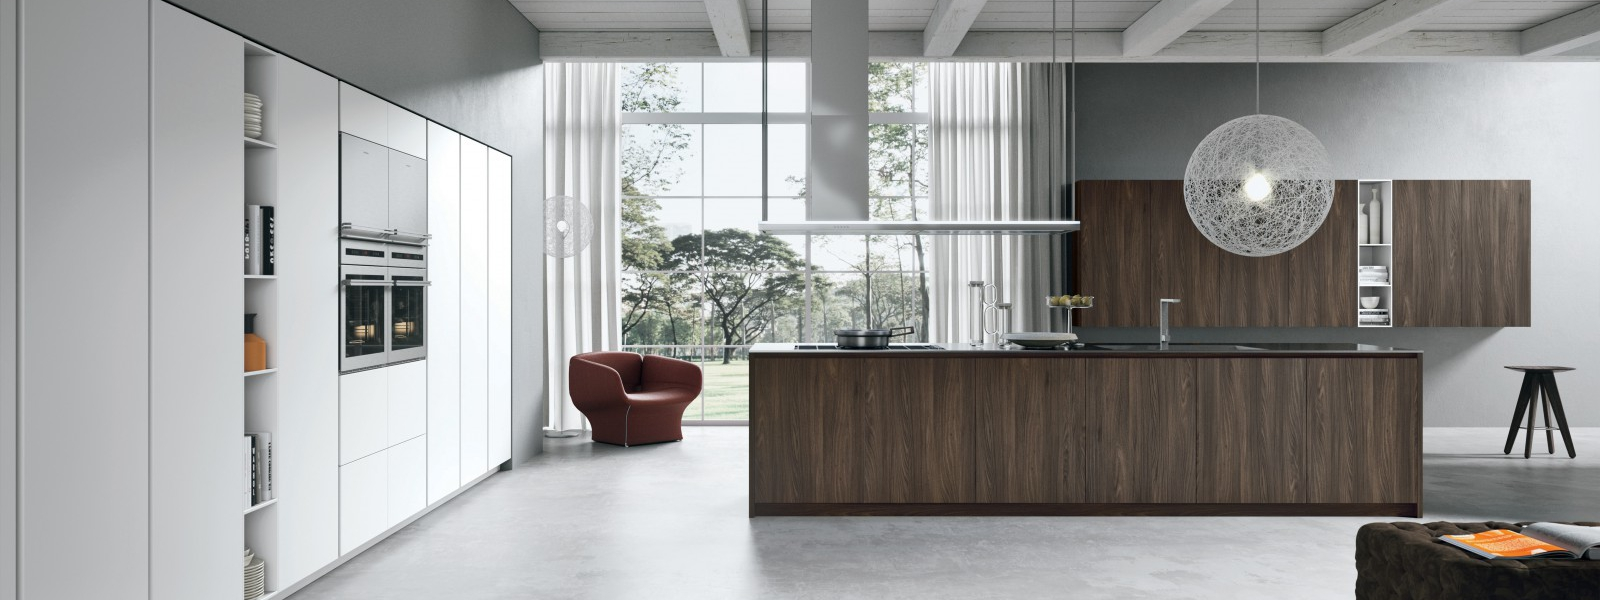 Opinioni Su Arrital Cucine arianuova | design d'interni